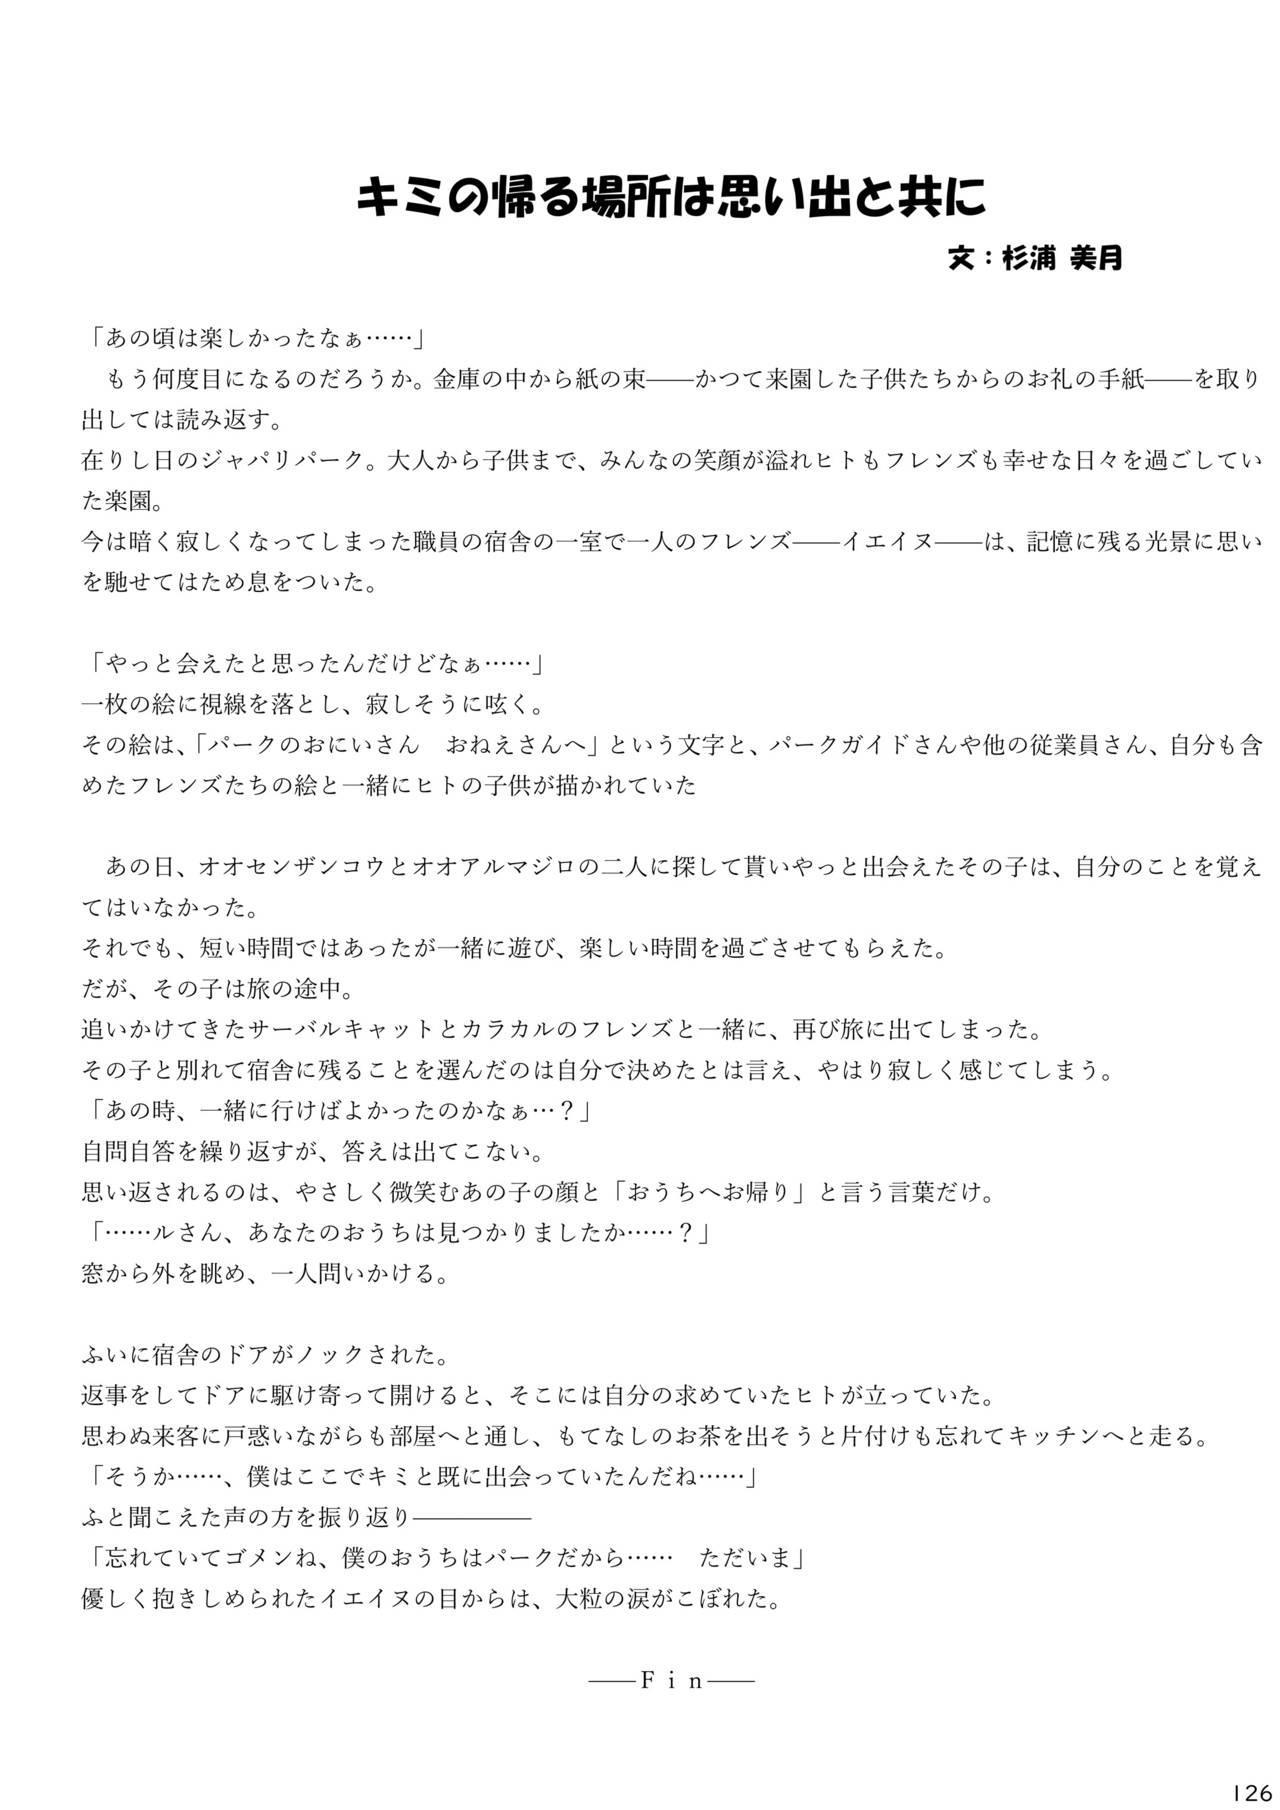 may Kemono Friends Thre Goudoushi 2 127